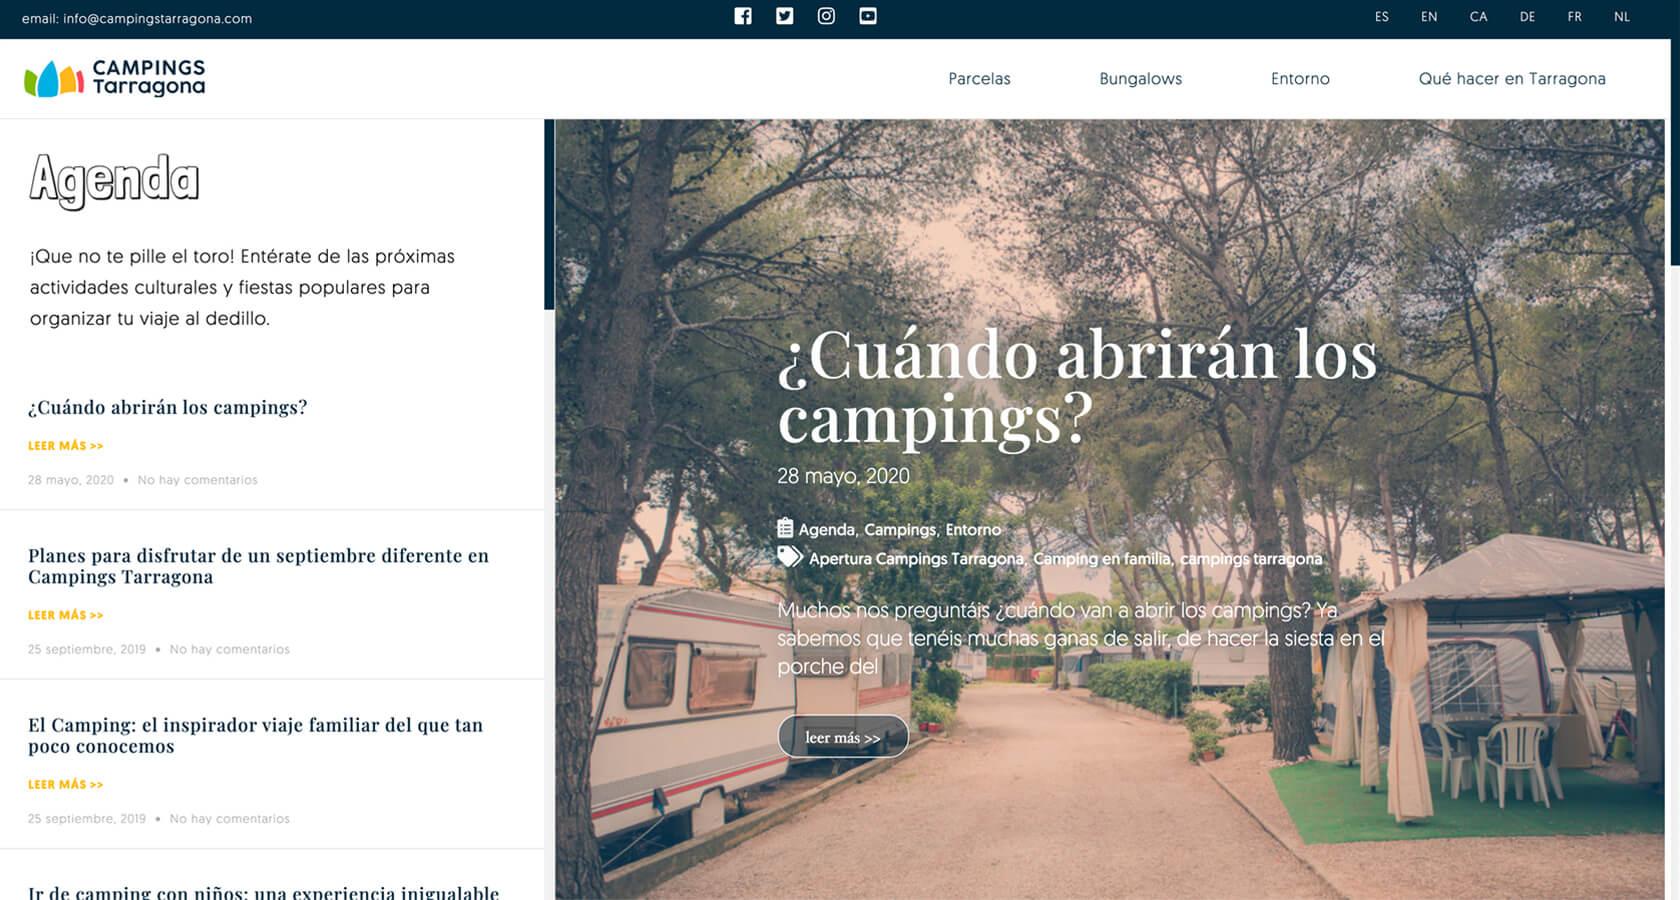 diseno-web-campingstarragona.com-03